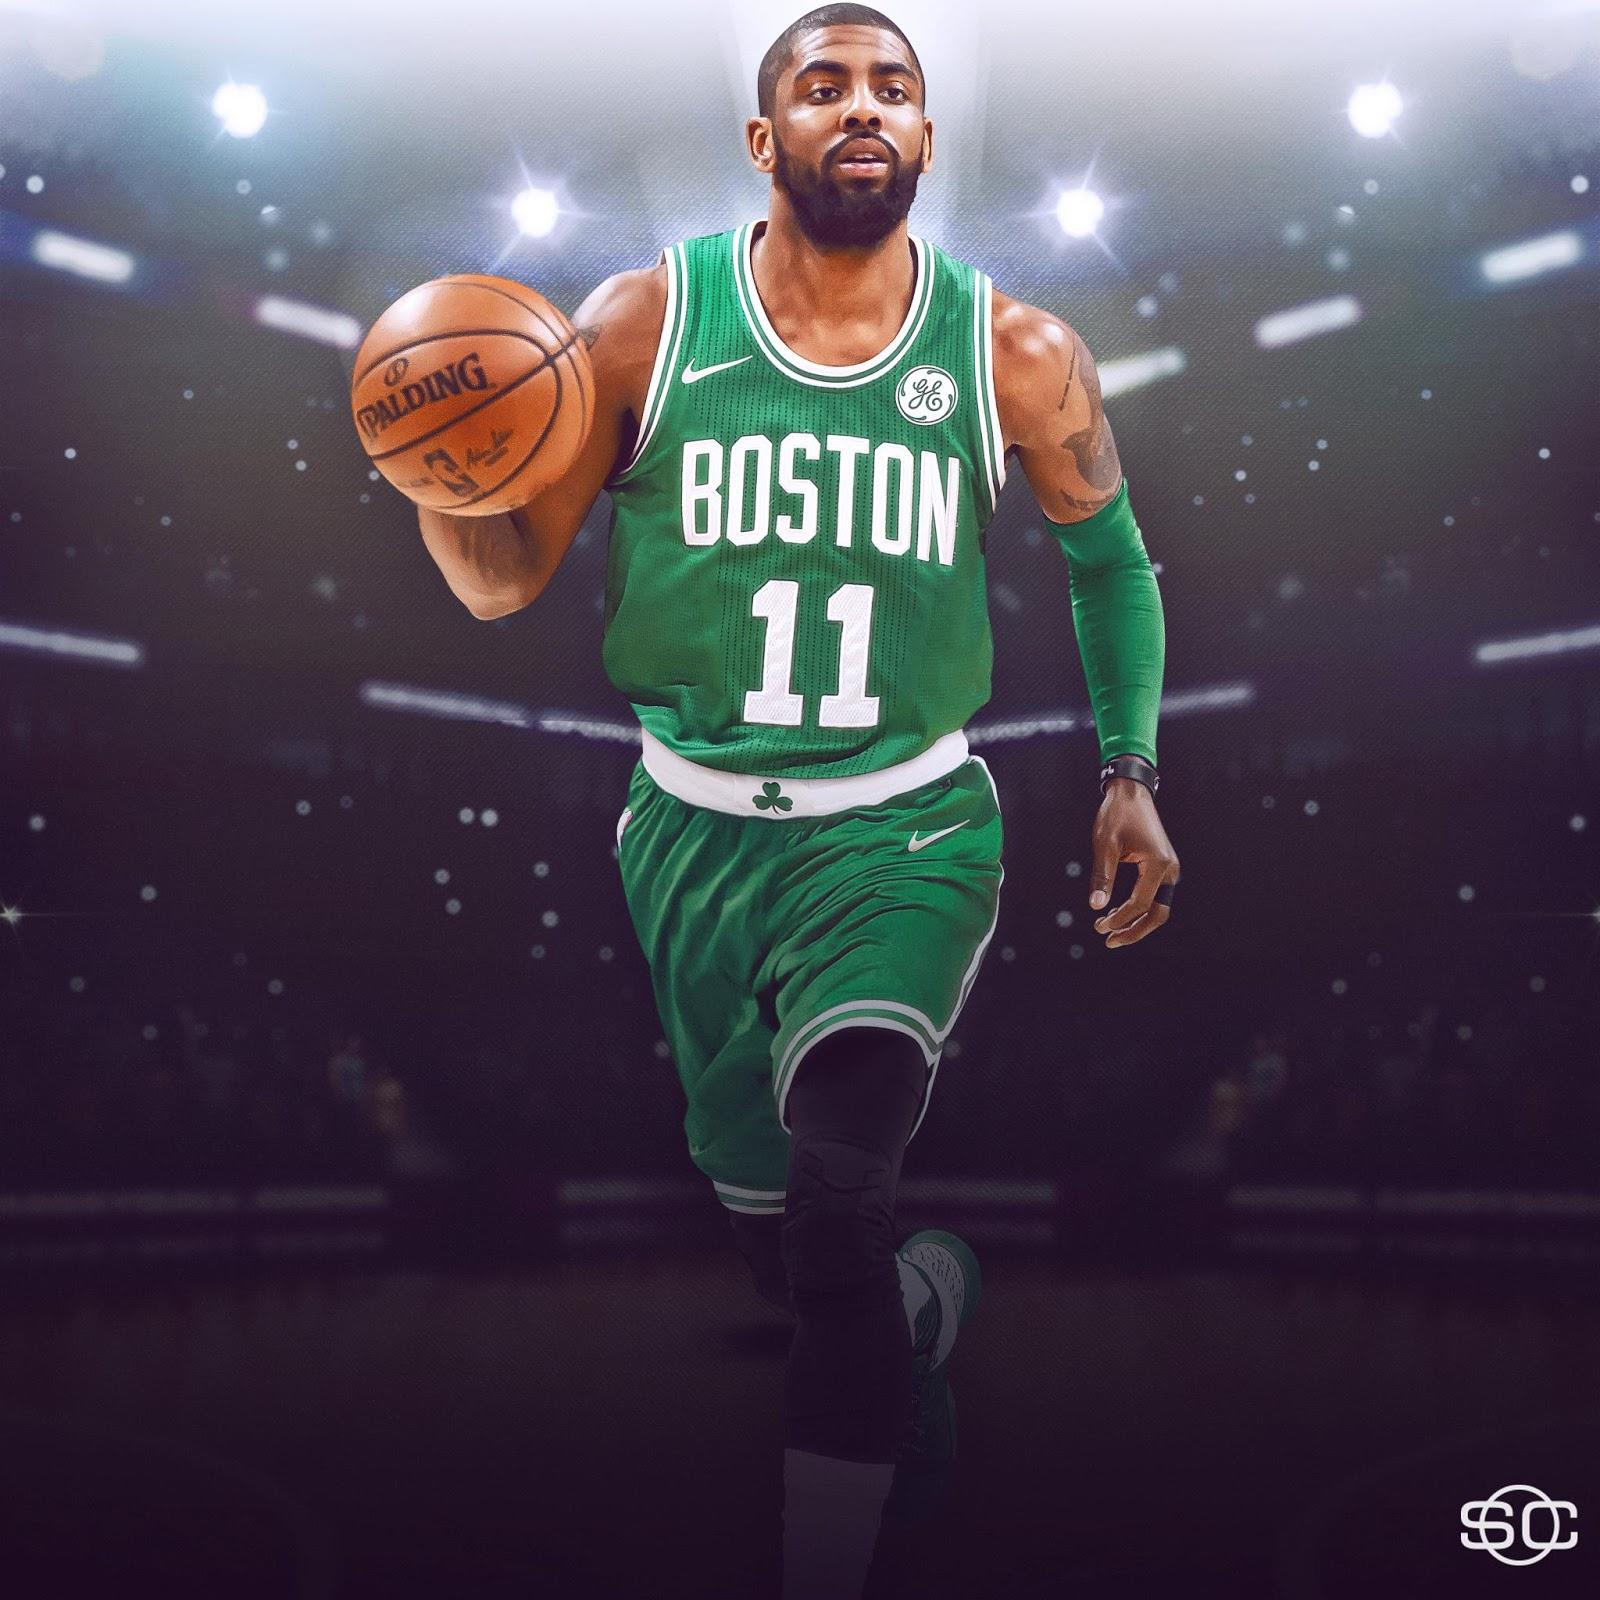 Nba Boston Celtics Kyrie Irving 1677731 Hd Wallpaper